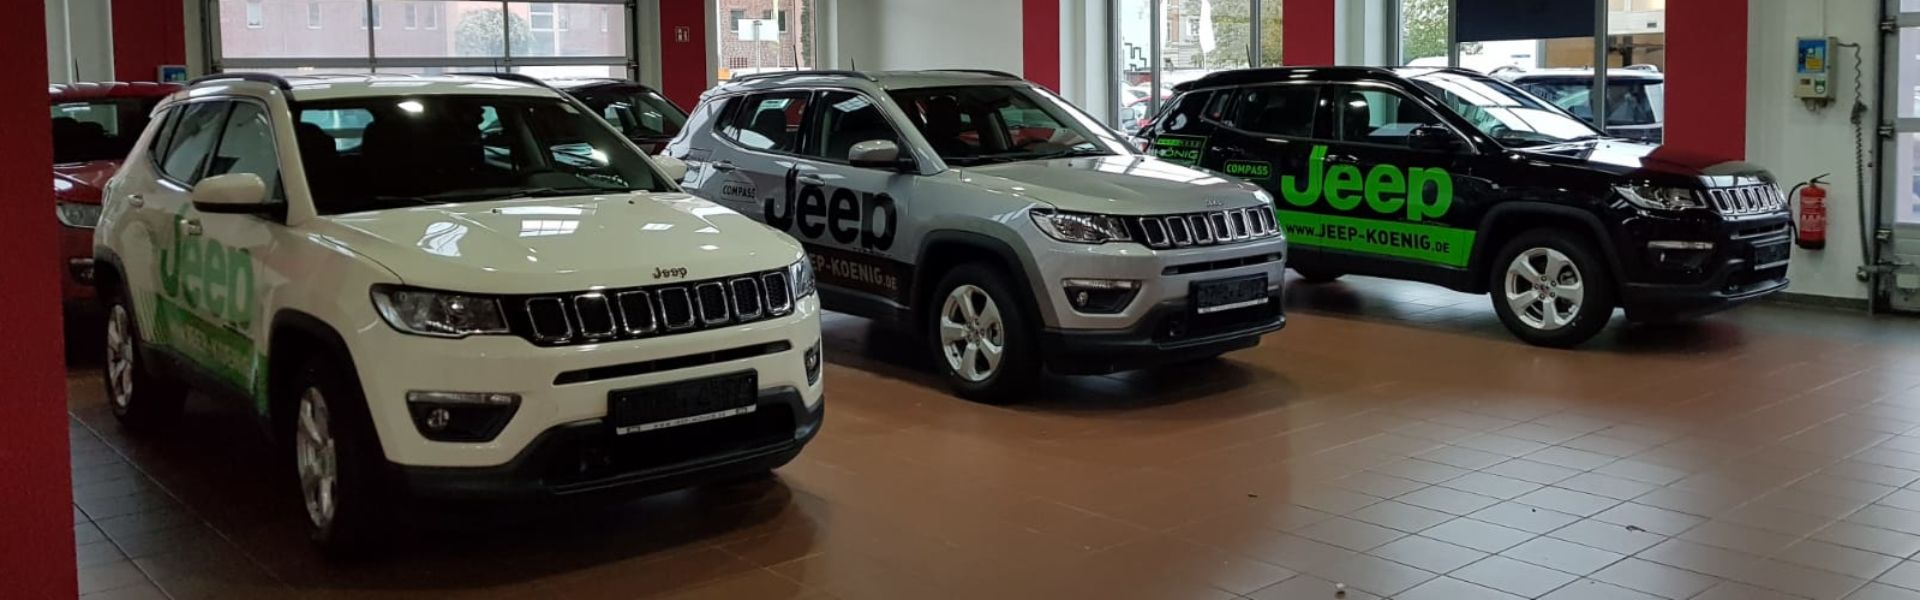 Autoaufkleber Jeep